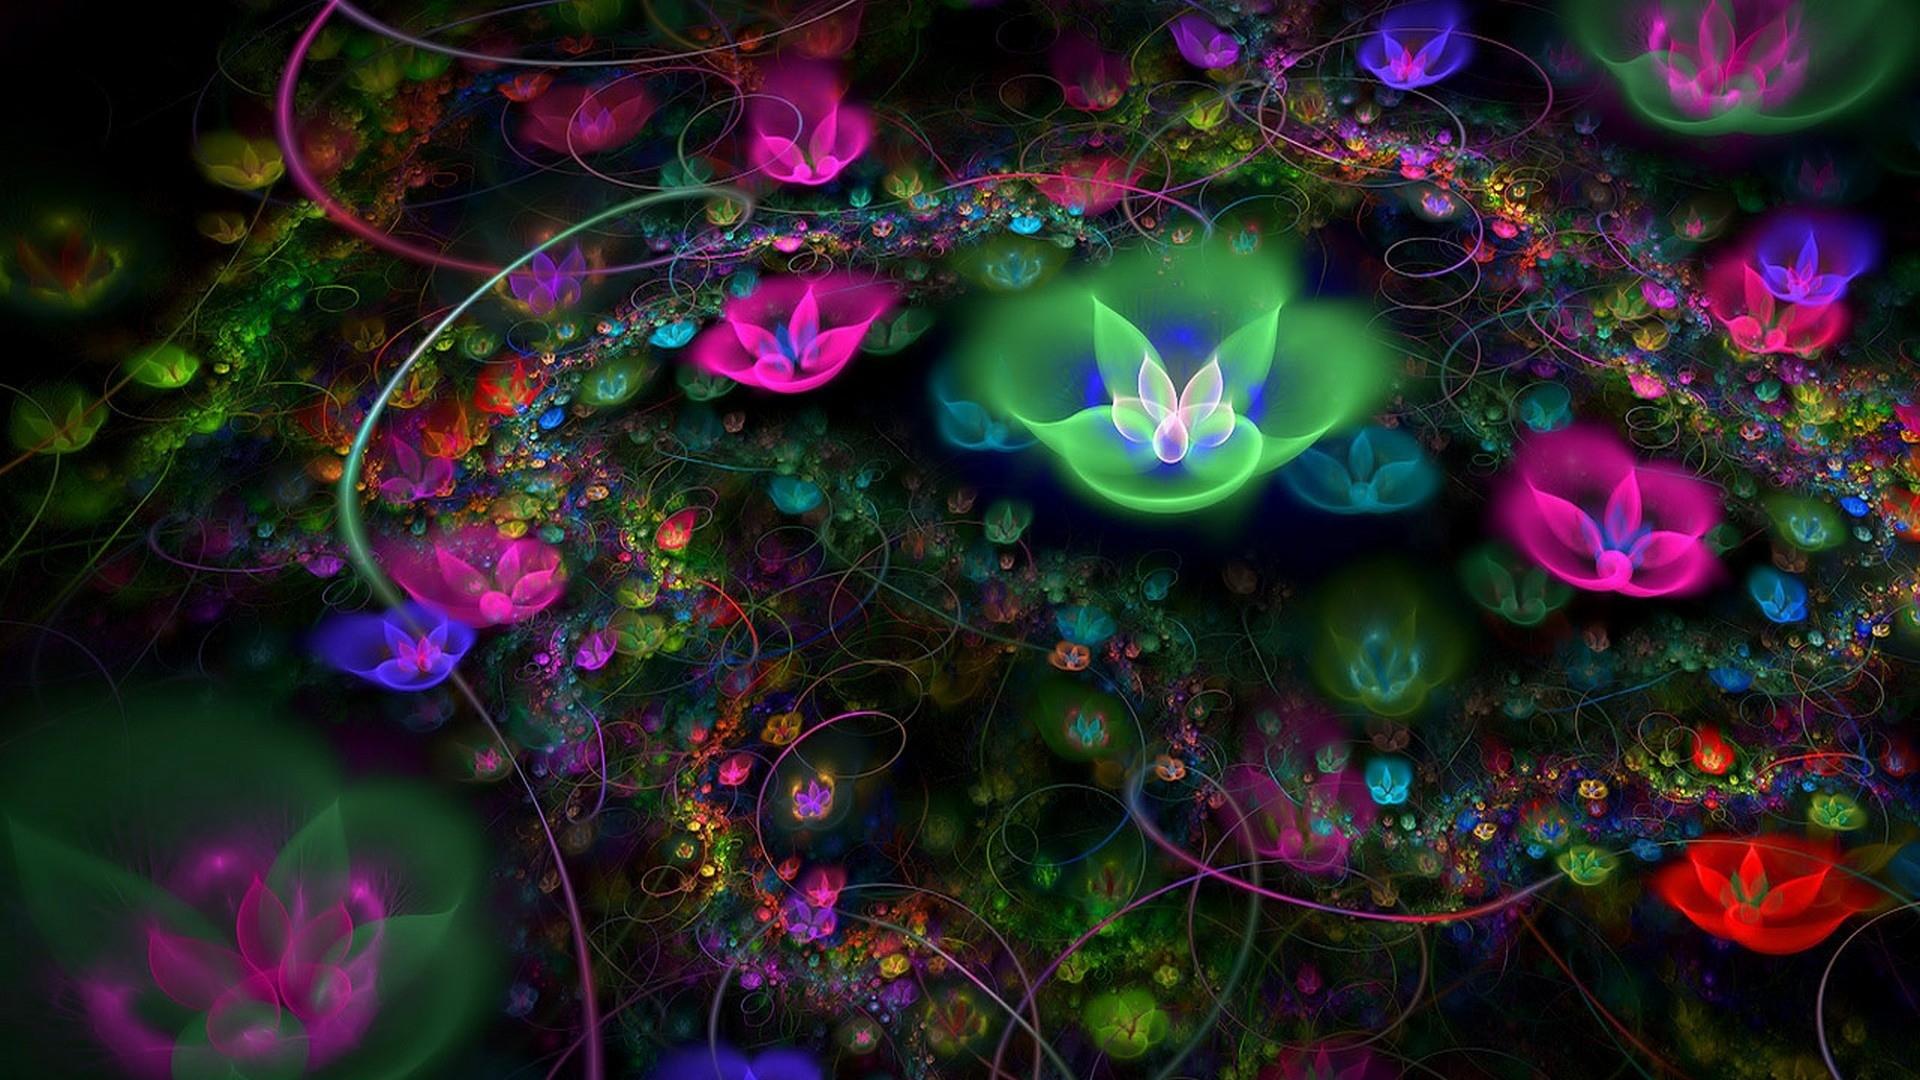 Hd fractals wallpapers 1080p wallpapersafari for Exclusive 3d wallpaper